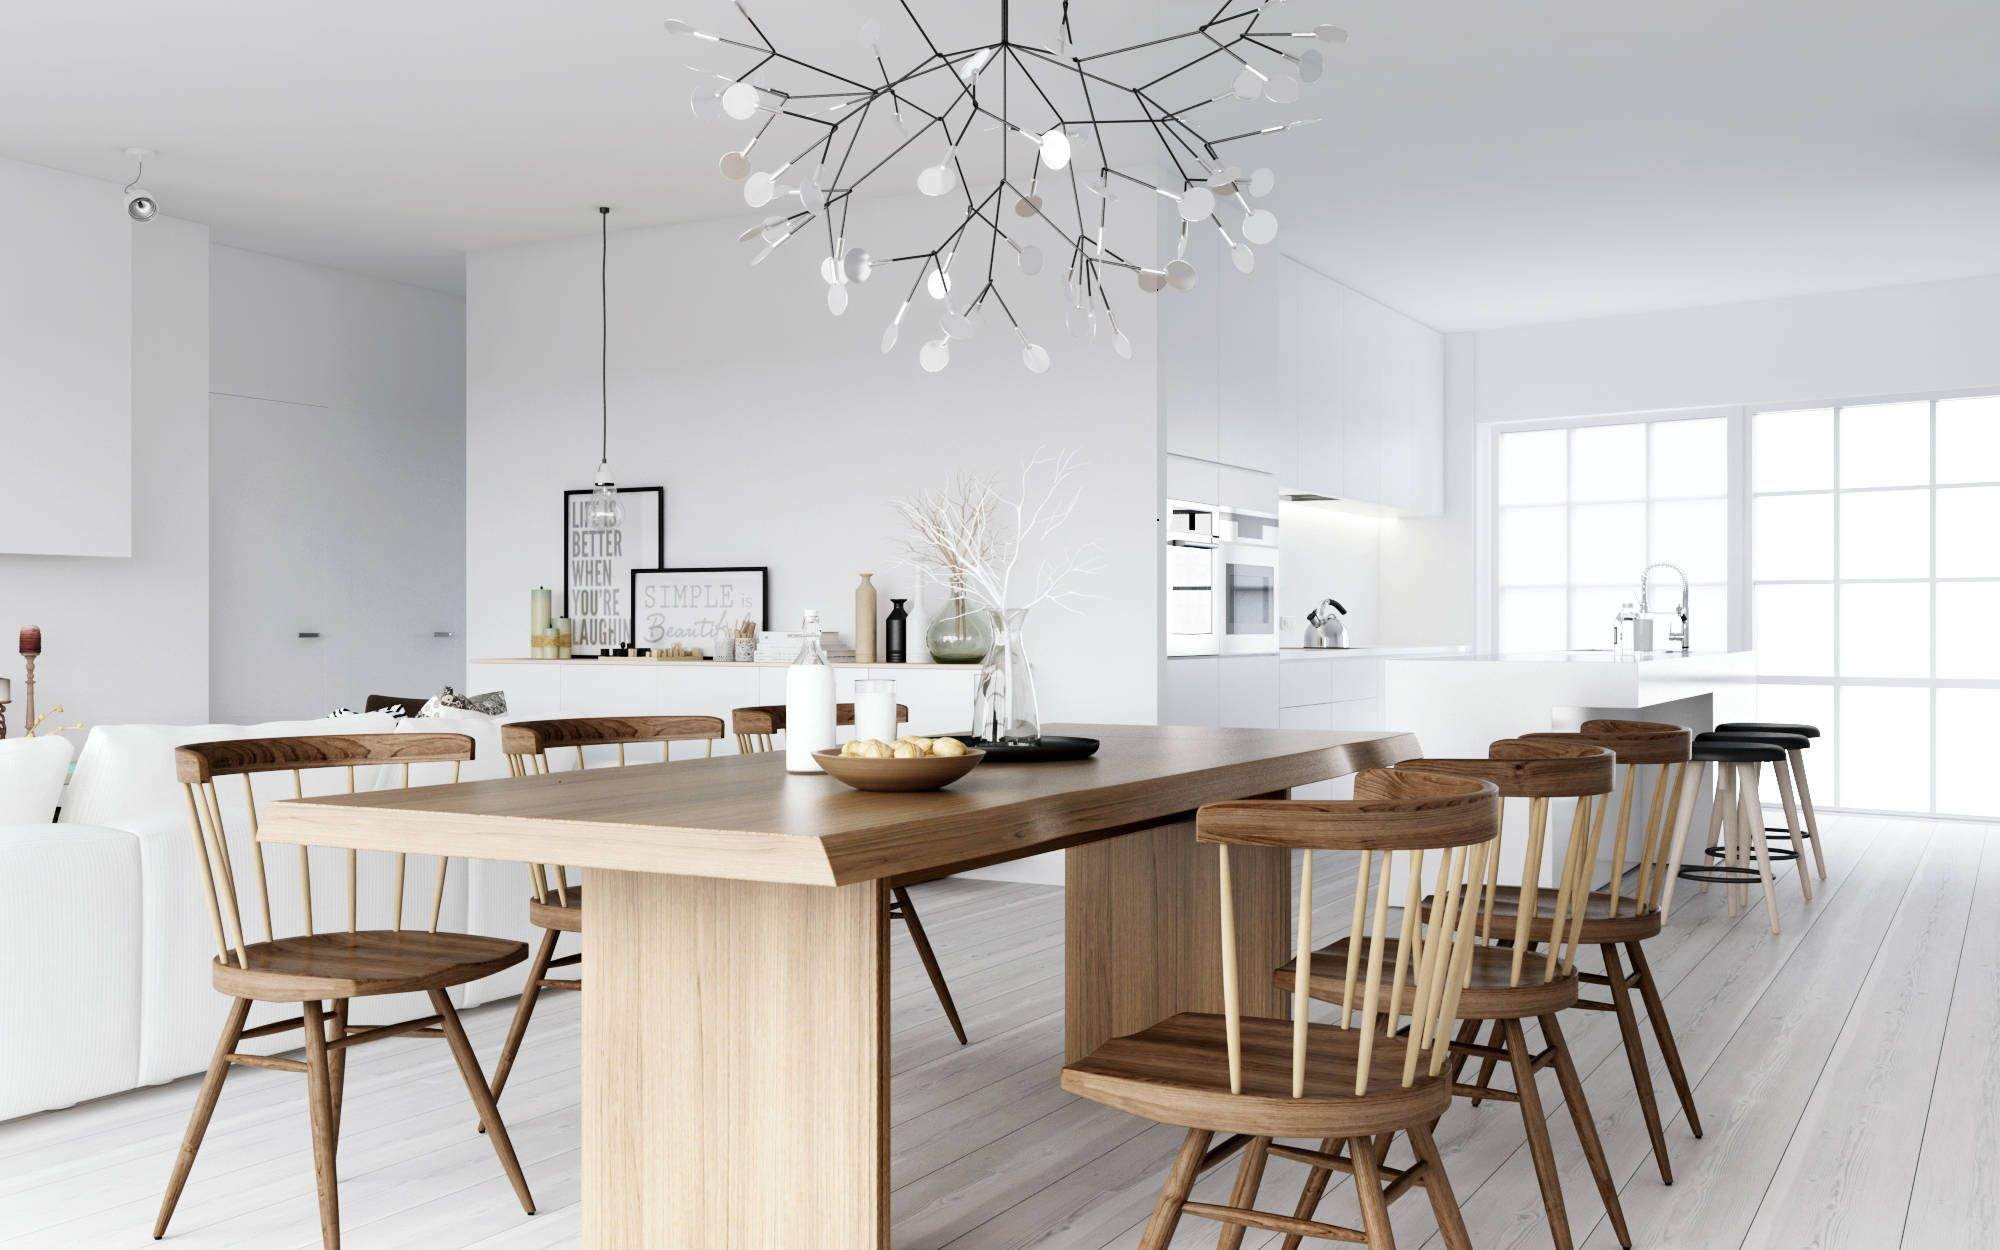 scandinavian interior design - 1000+ images about Scandinavische design on Pinterest ...